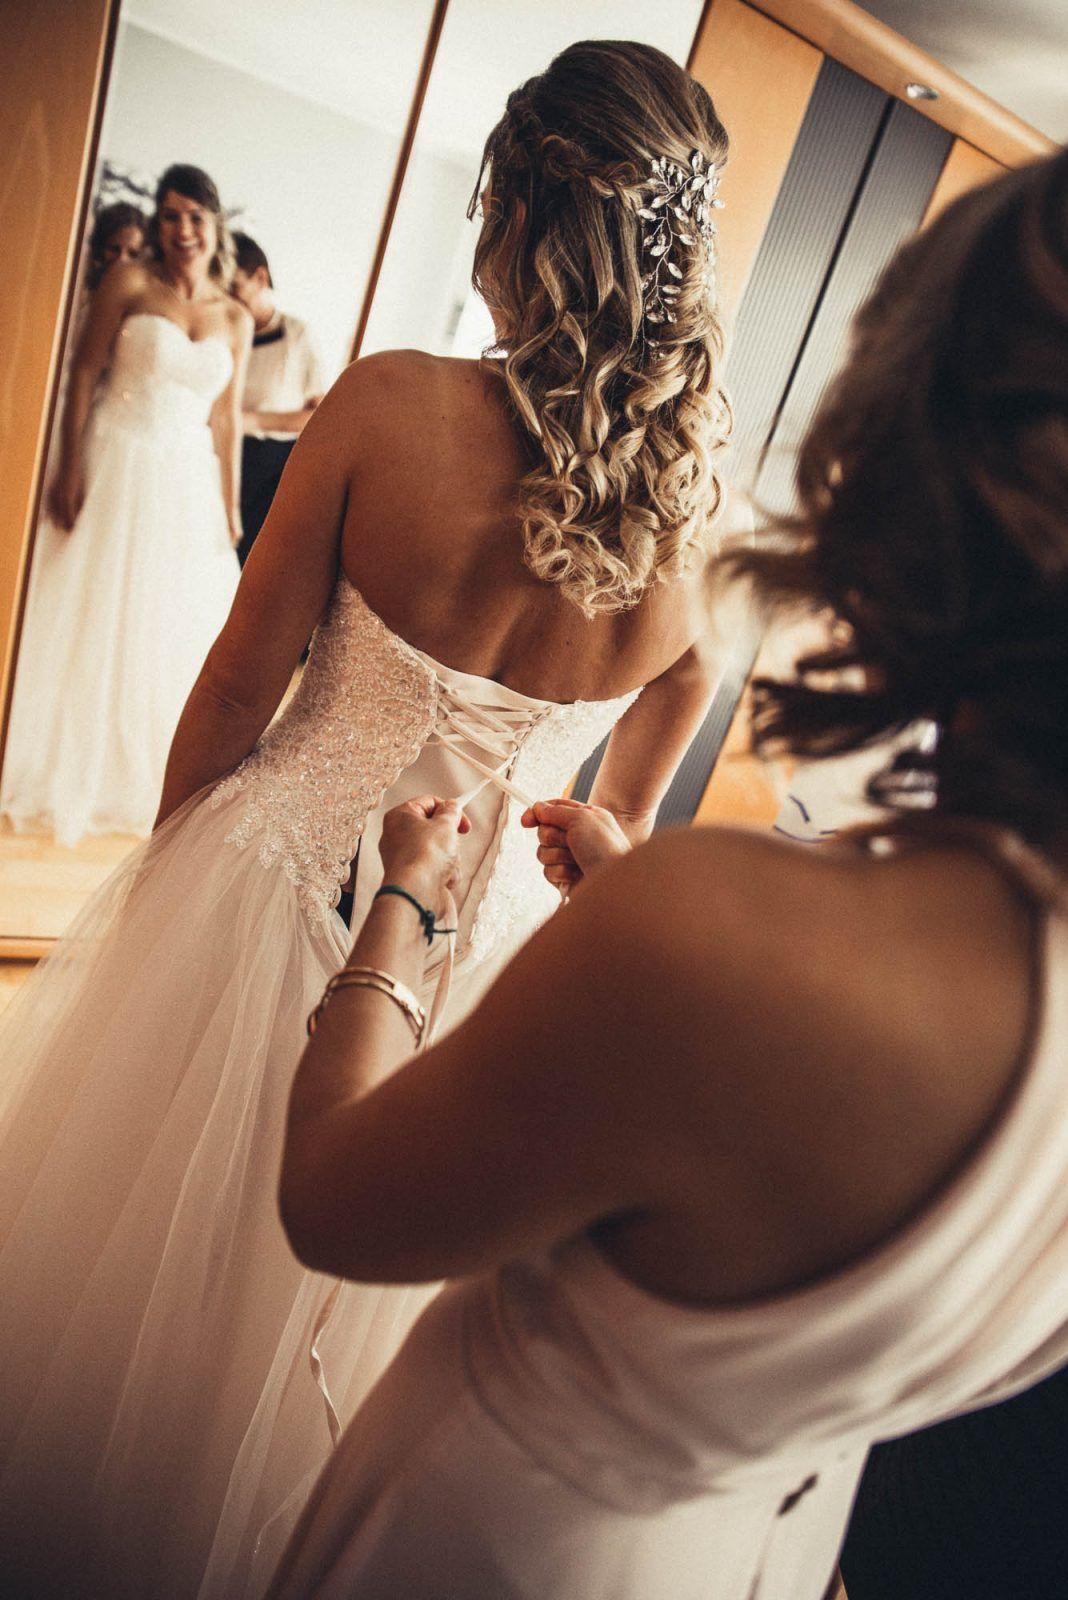 Hochzeitsfotograf Siegburg Fotograf Sven Palm BJ